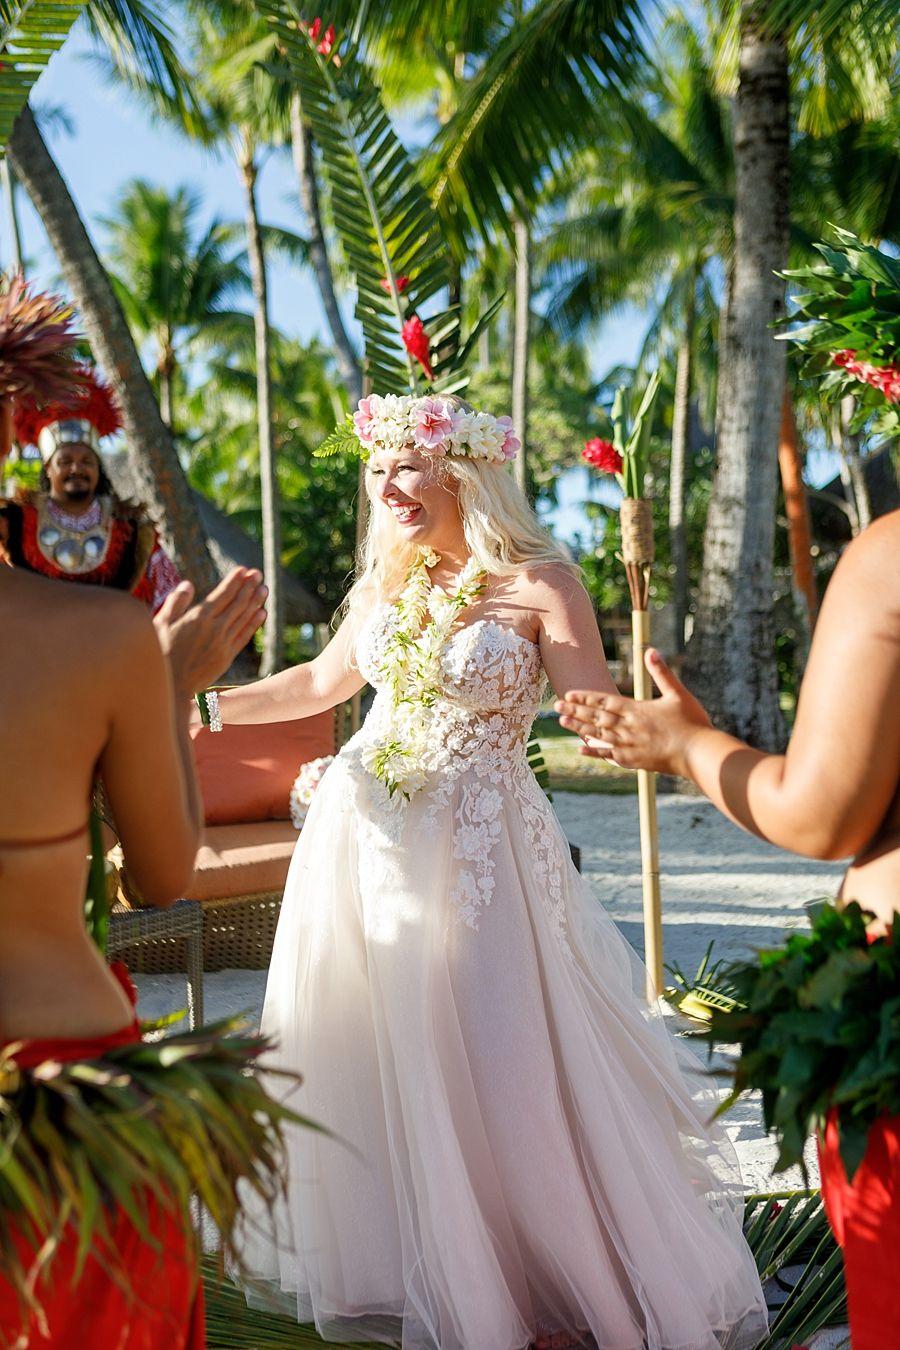 Breathtaking Bora Bora Elopement Wedding And Trash The Dress Photos Destination Wedding Details Elope Wedding Beach Wedding Dress Most Beautiful Wedding Dresses [ 1350 x 900 Pixel ]